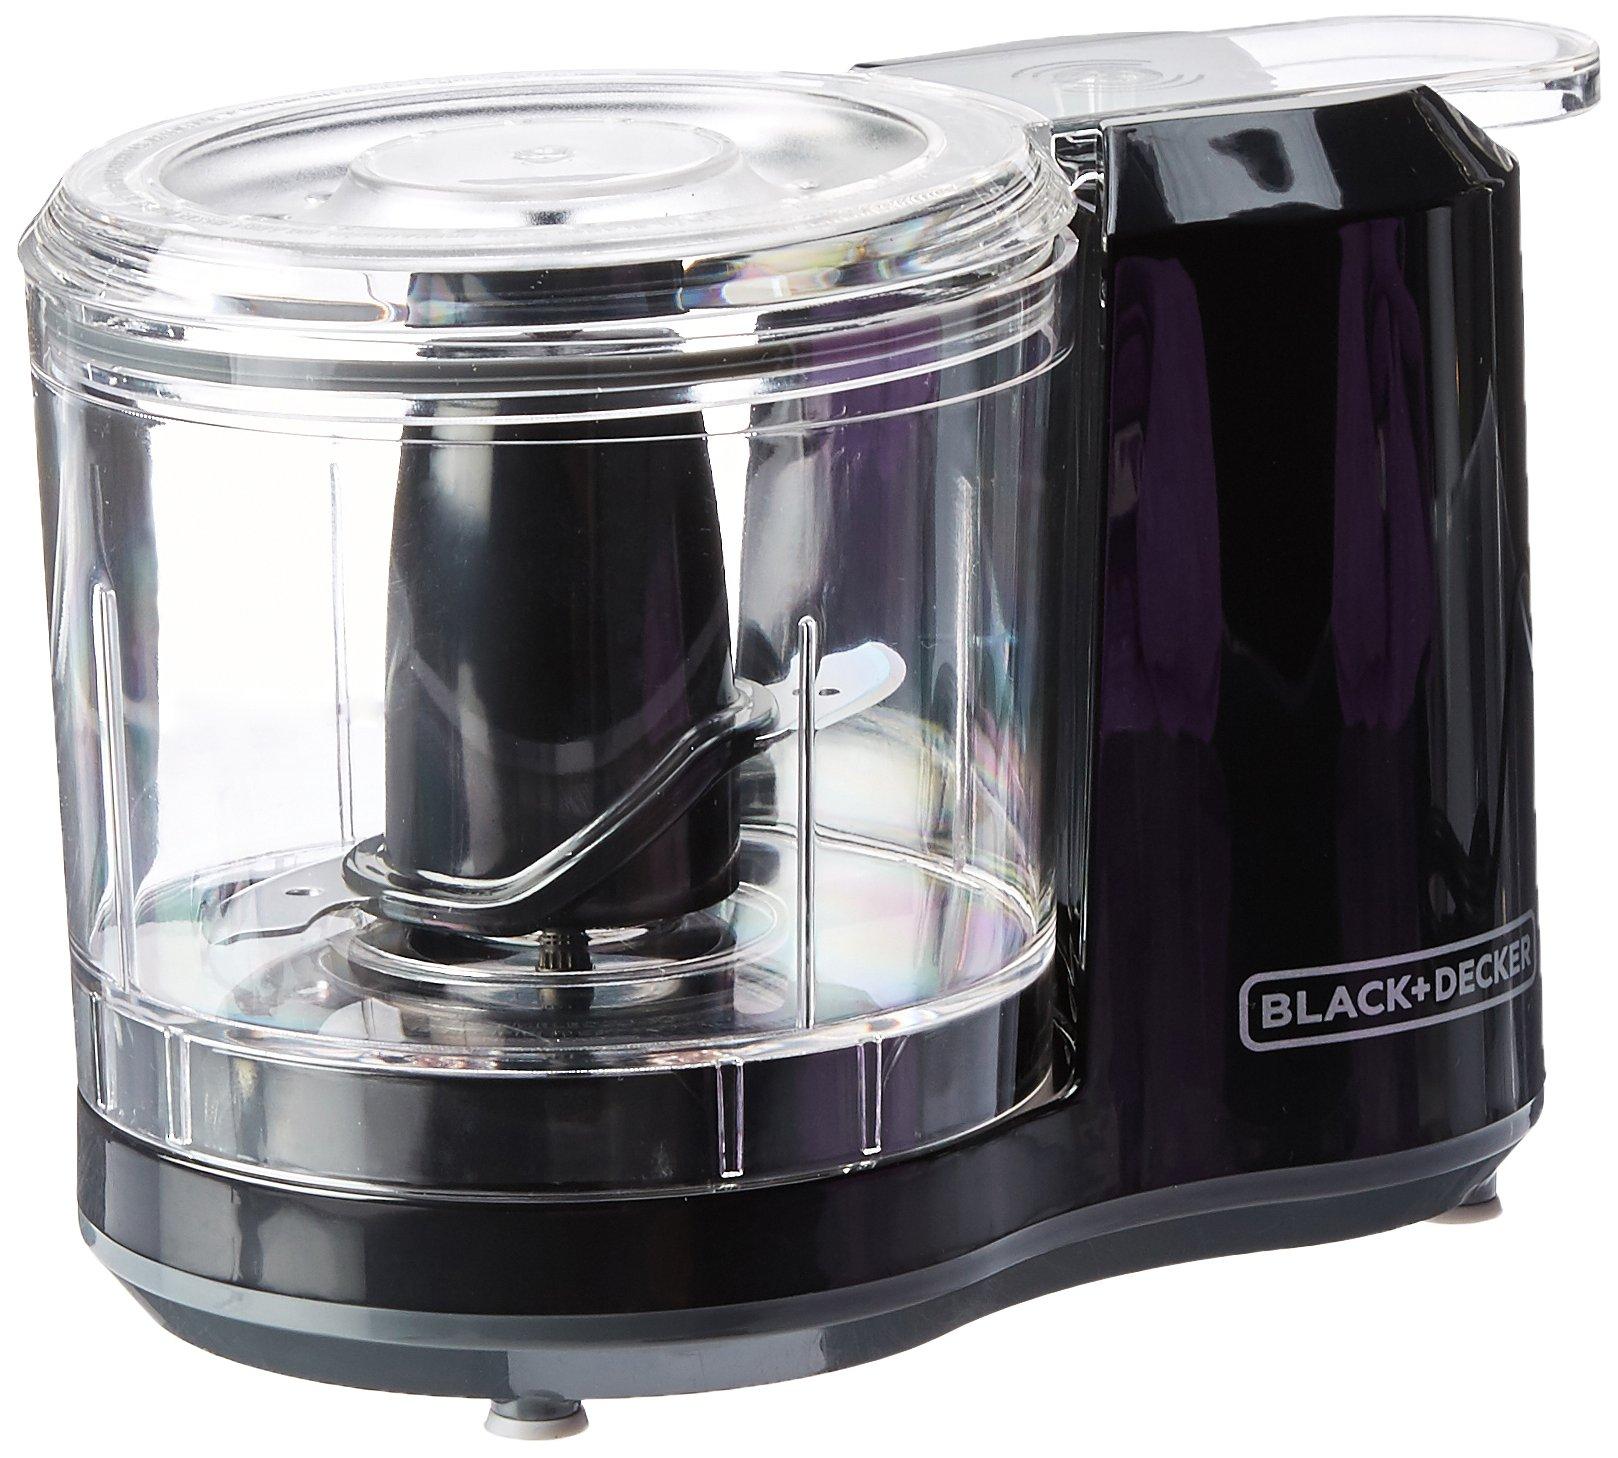 BLACK+DECKER 1.5-Cup Electric Food Chopper, Improved Assembly, Black, HC150B by BLACK+DECKER